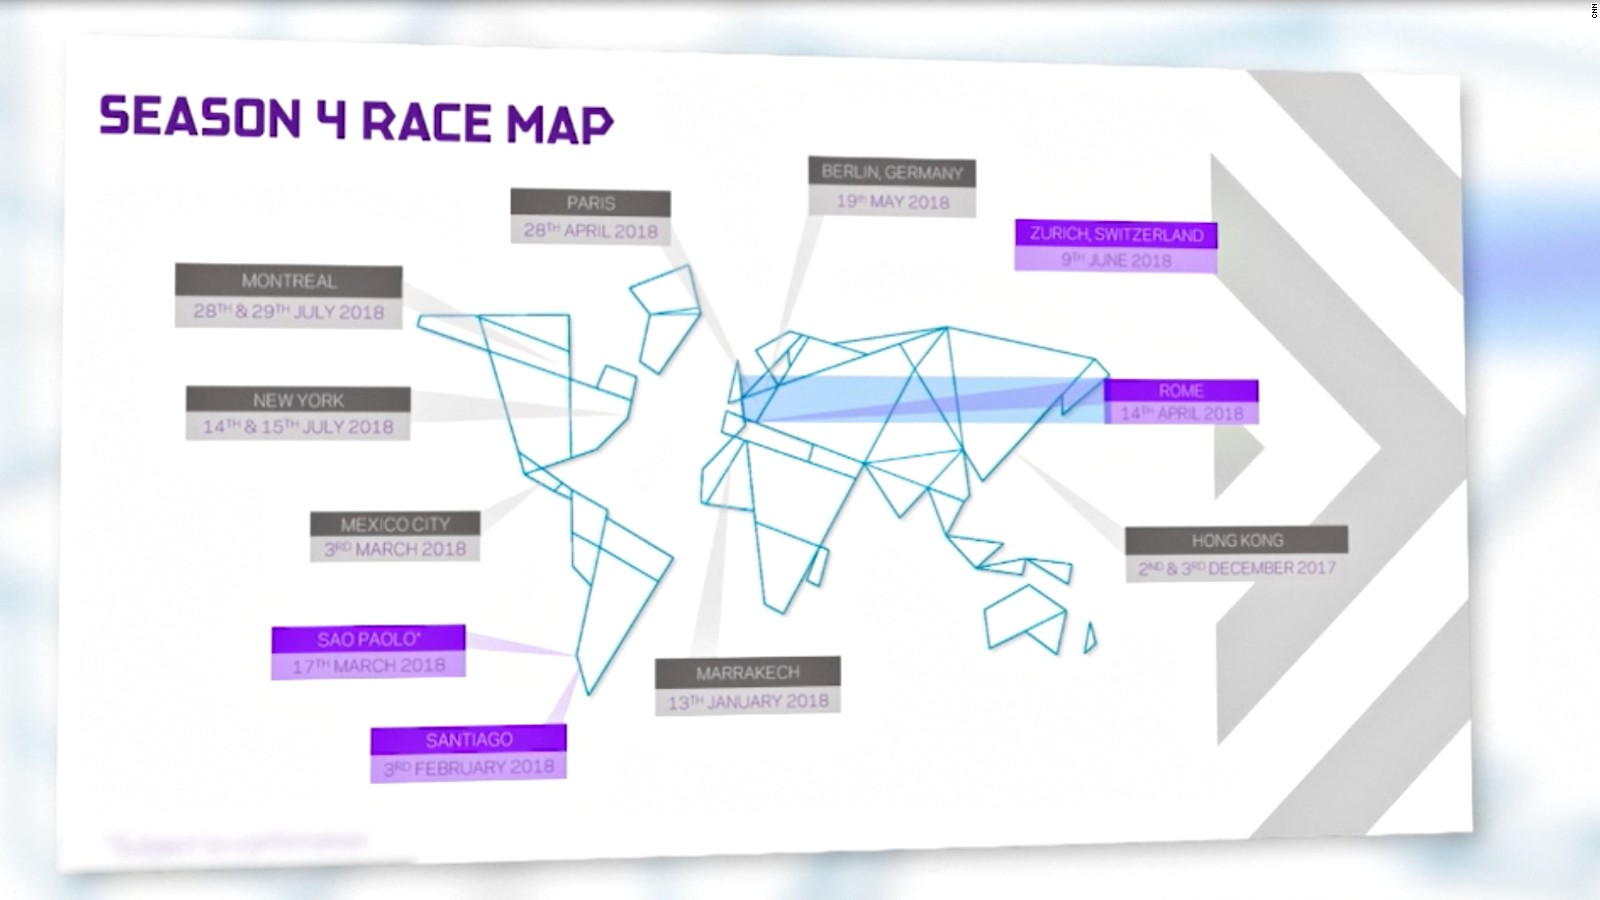 Formula E gears up for season 4